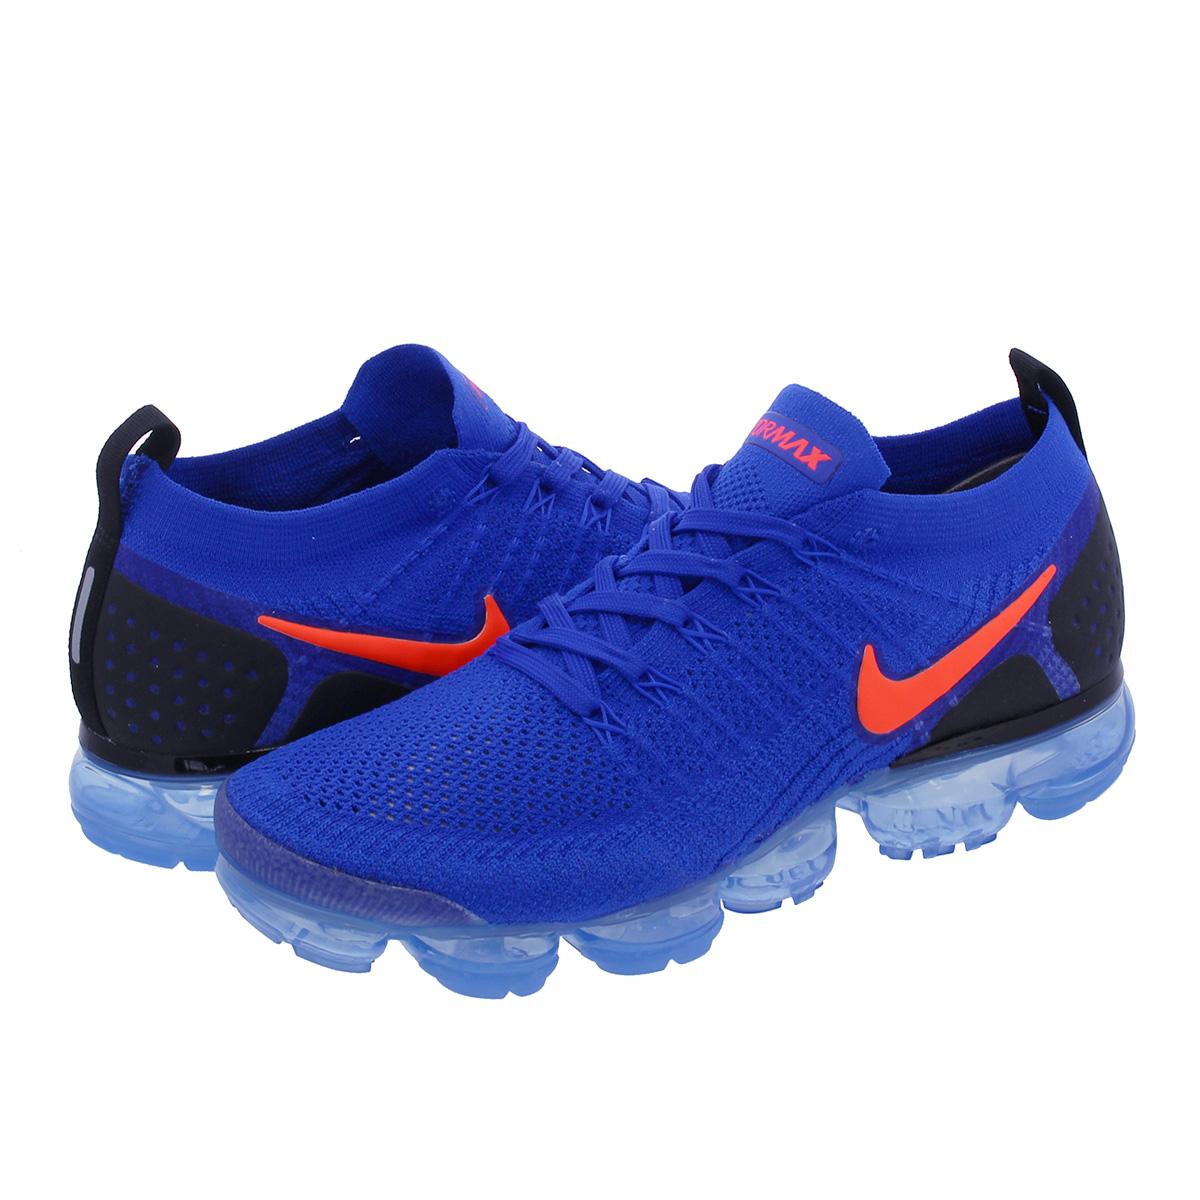 wholesale dealer 72c75 cf0b8 NIKE AIR VAPORMAX FLYKNIT 2 Nike vapor max fried food knit 2 RACER  BLUE/TOTAL CRIMSON/BLACK 942,842-400